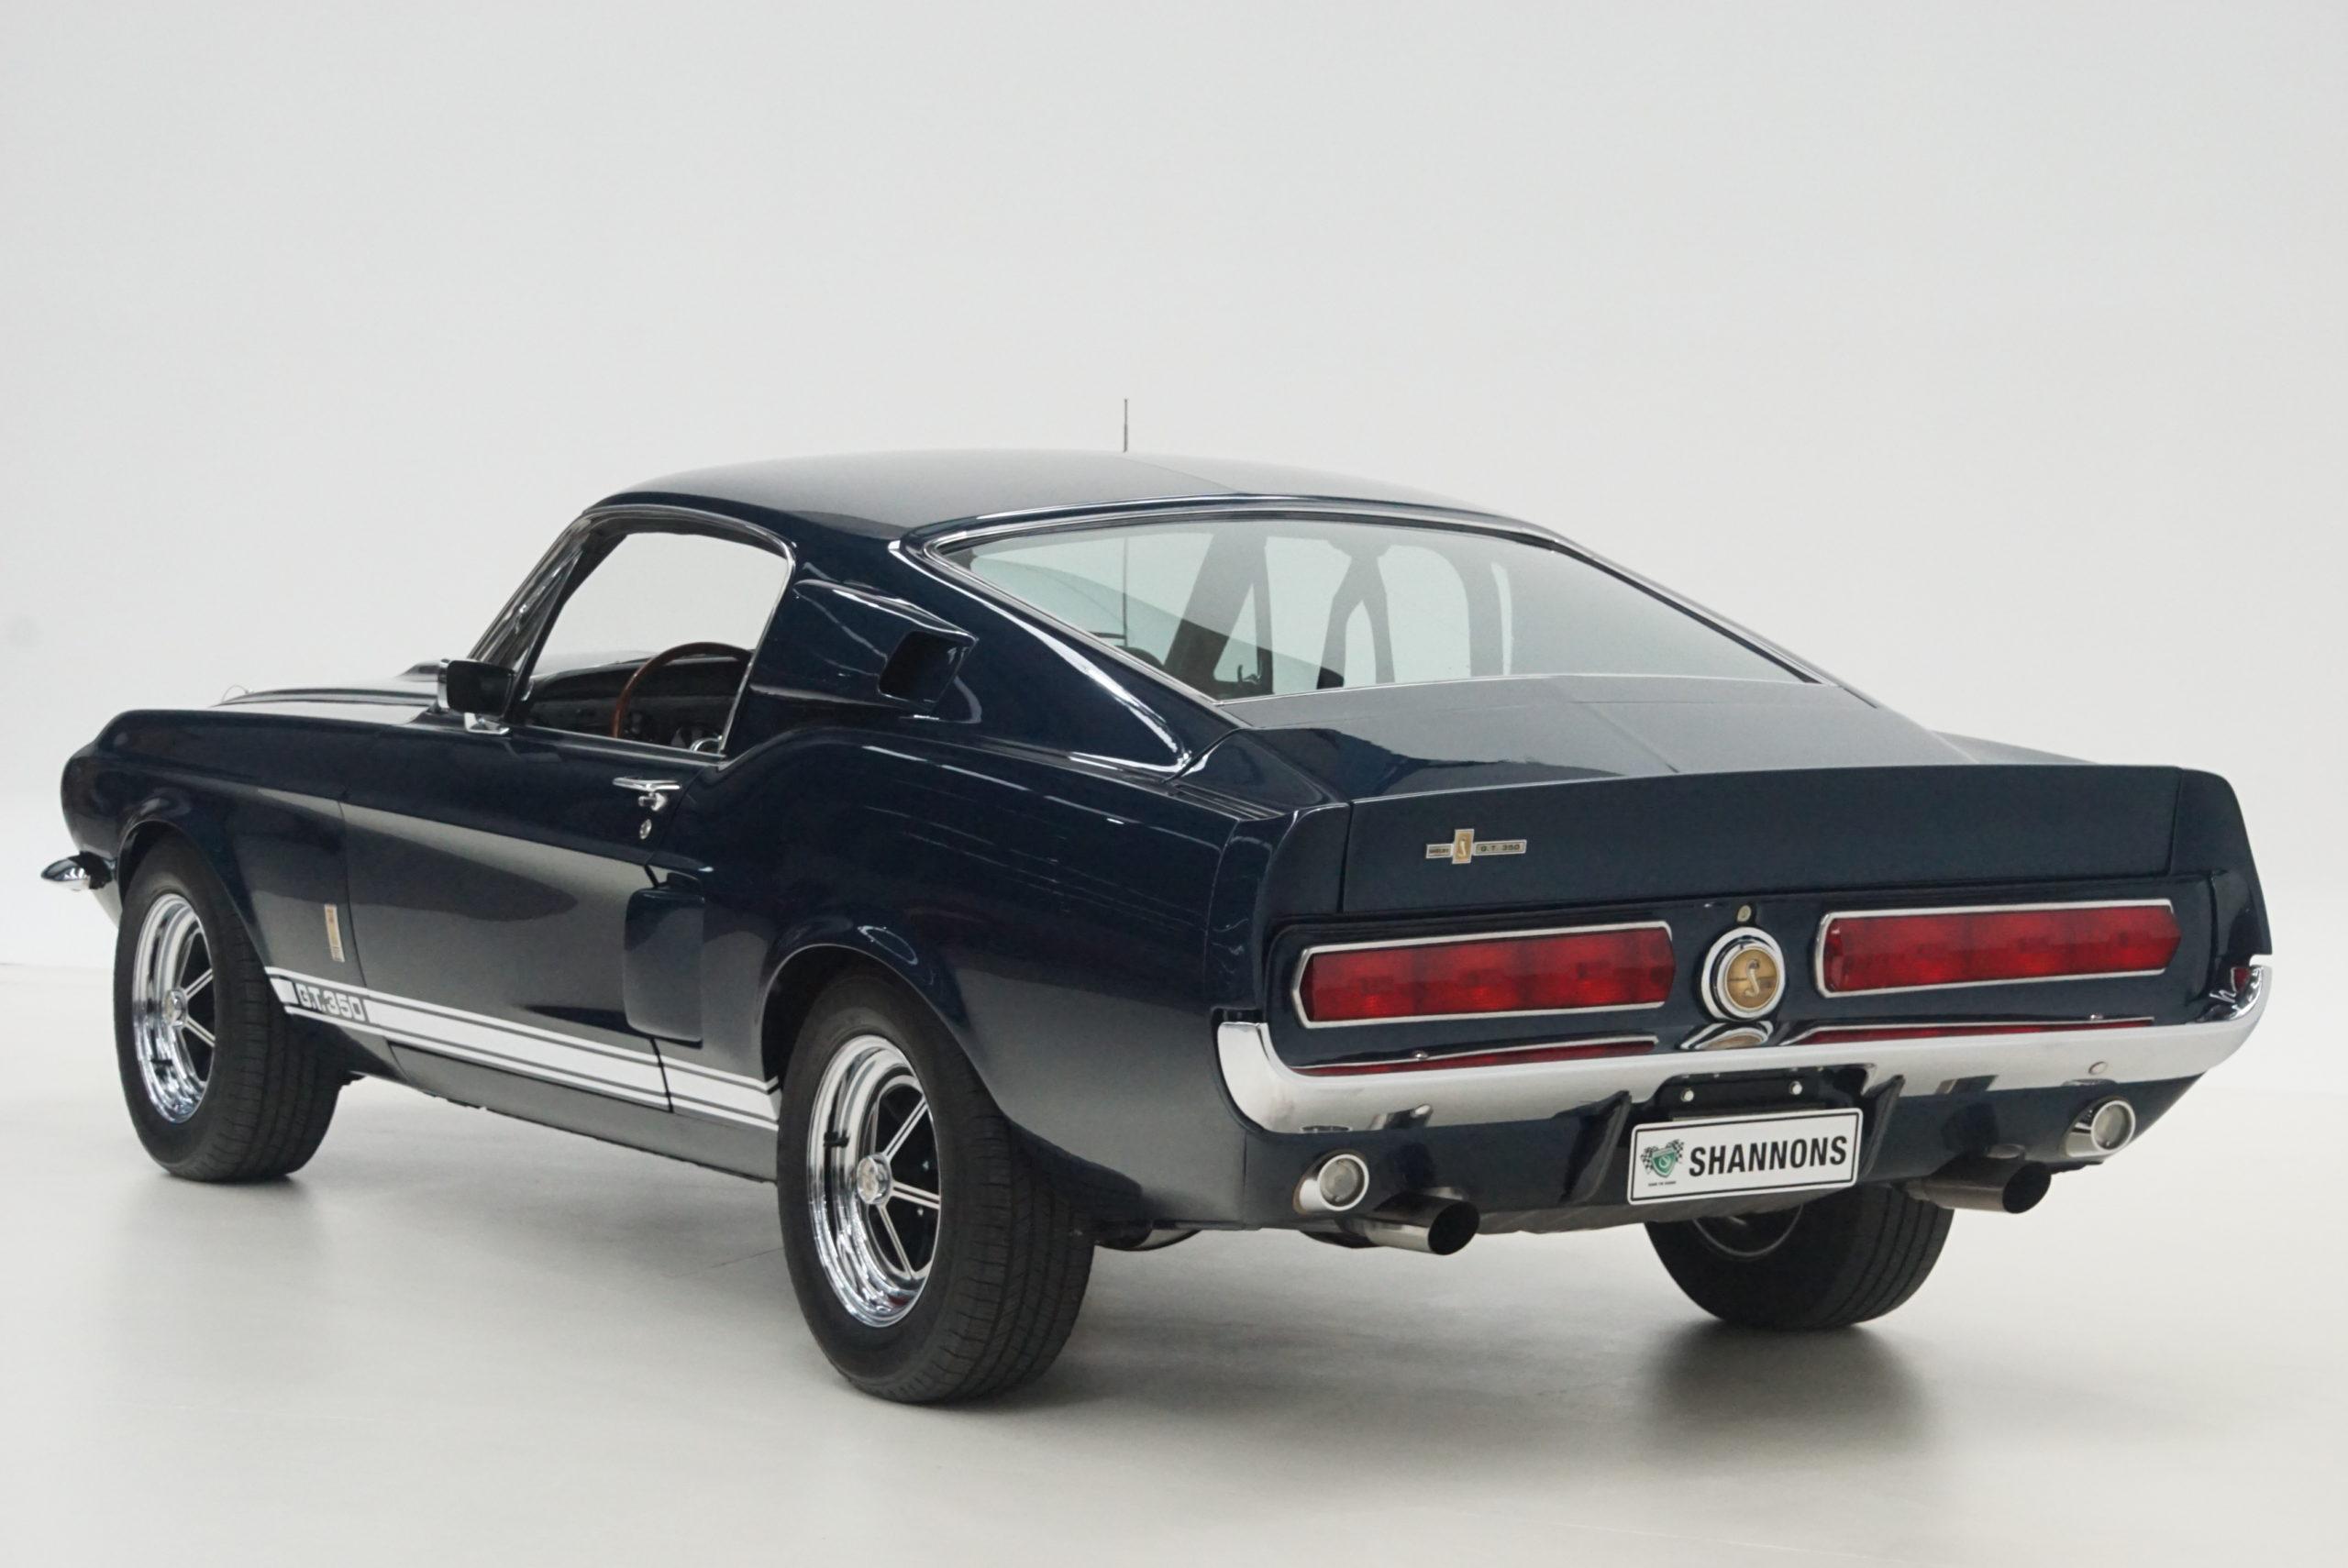 1967 Shelby Mustang GT350 Fastback trois quarts arrière gauche - Shannons Auctions avril 2021.